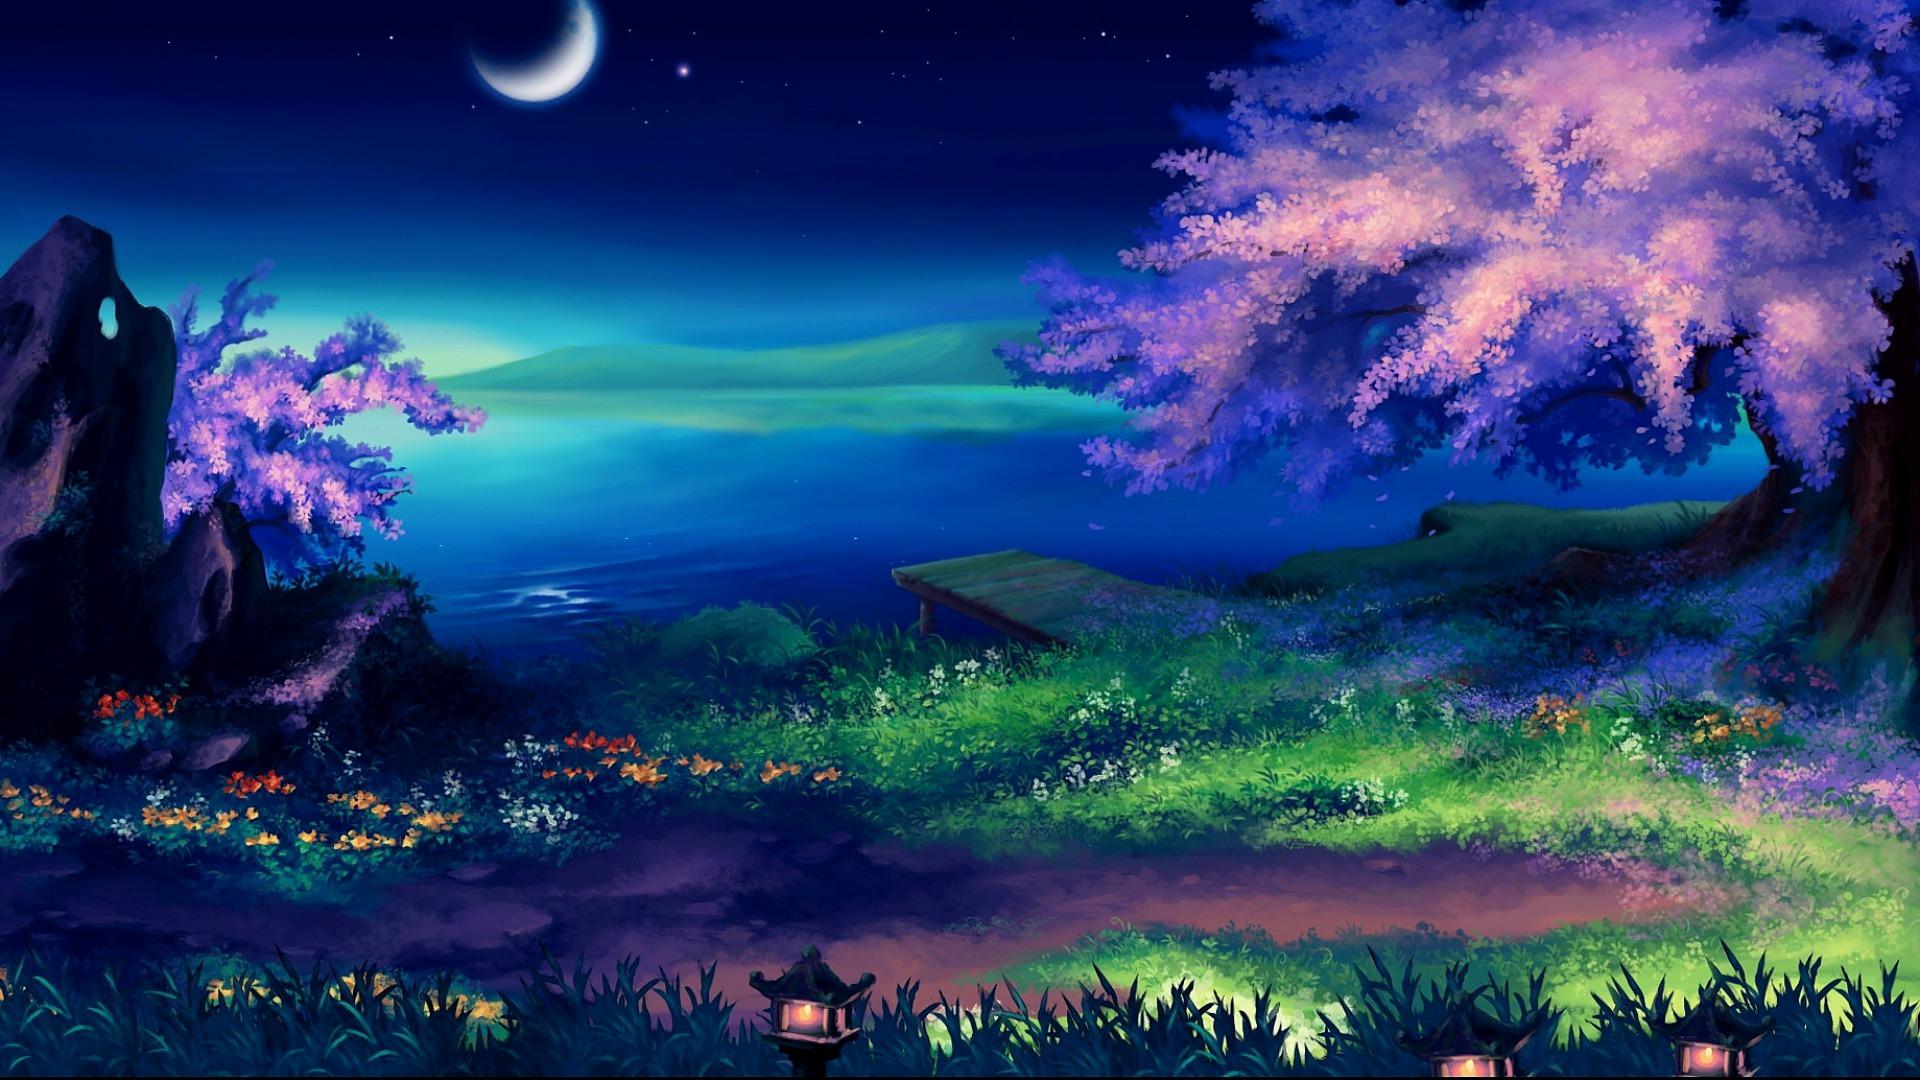 Beautiful Fantasy Wallpaper Iphone 1920x1080 Wallpaper Teahub Io